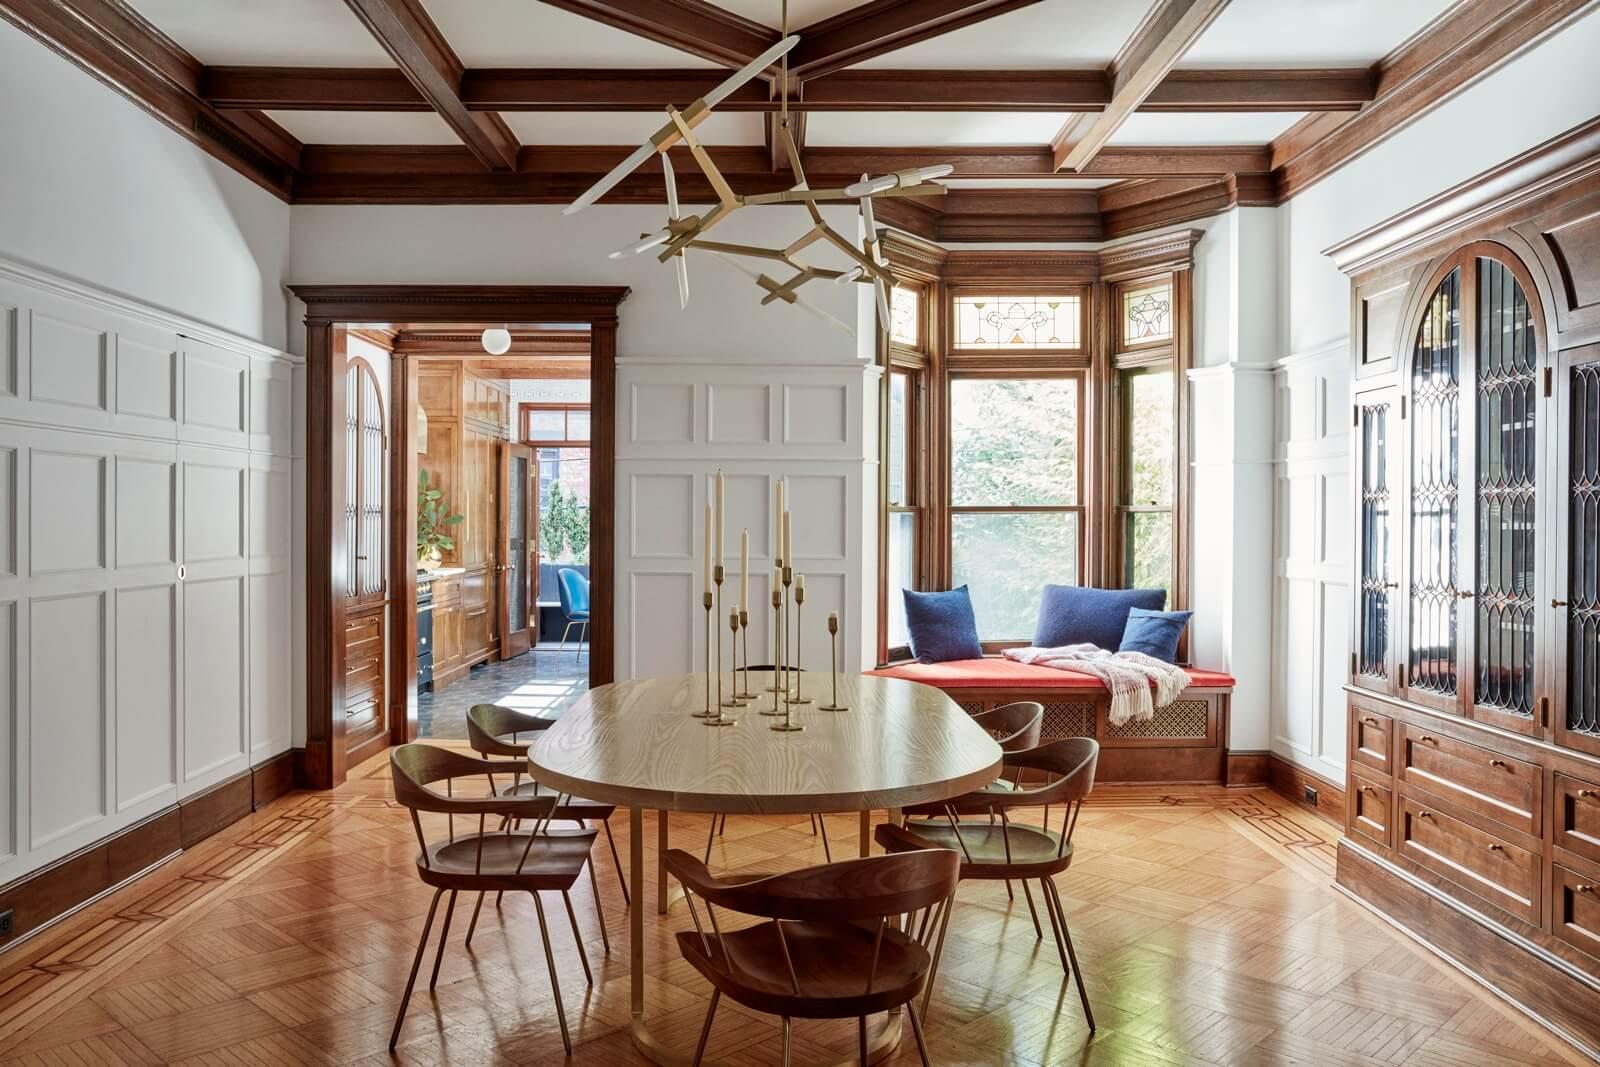 Interiors renovation